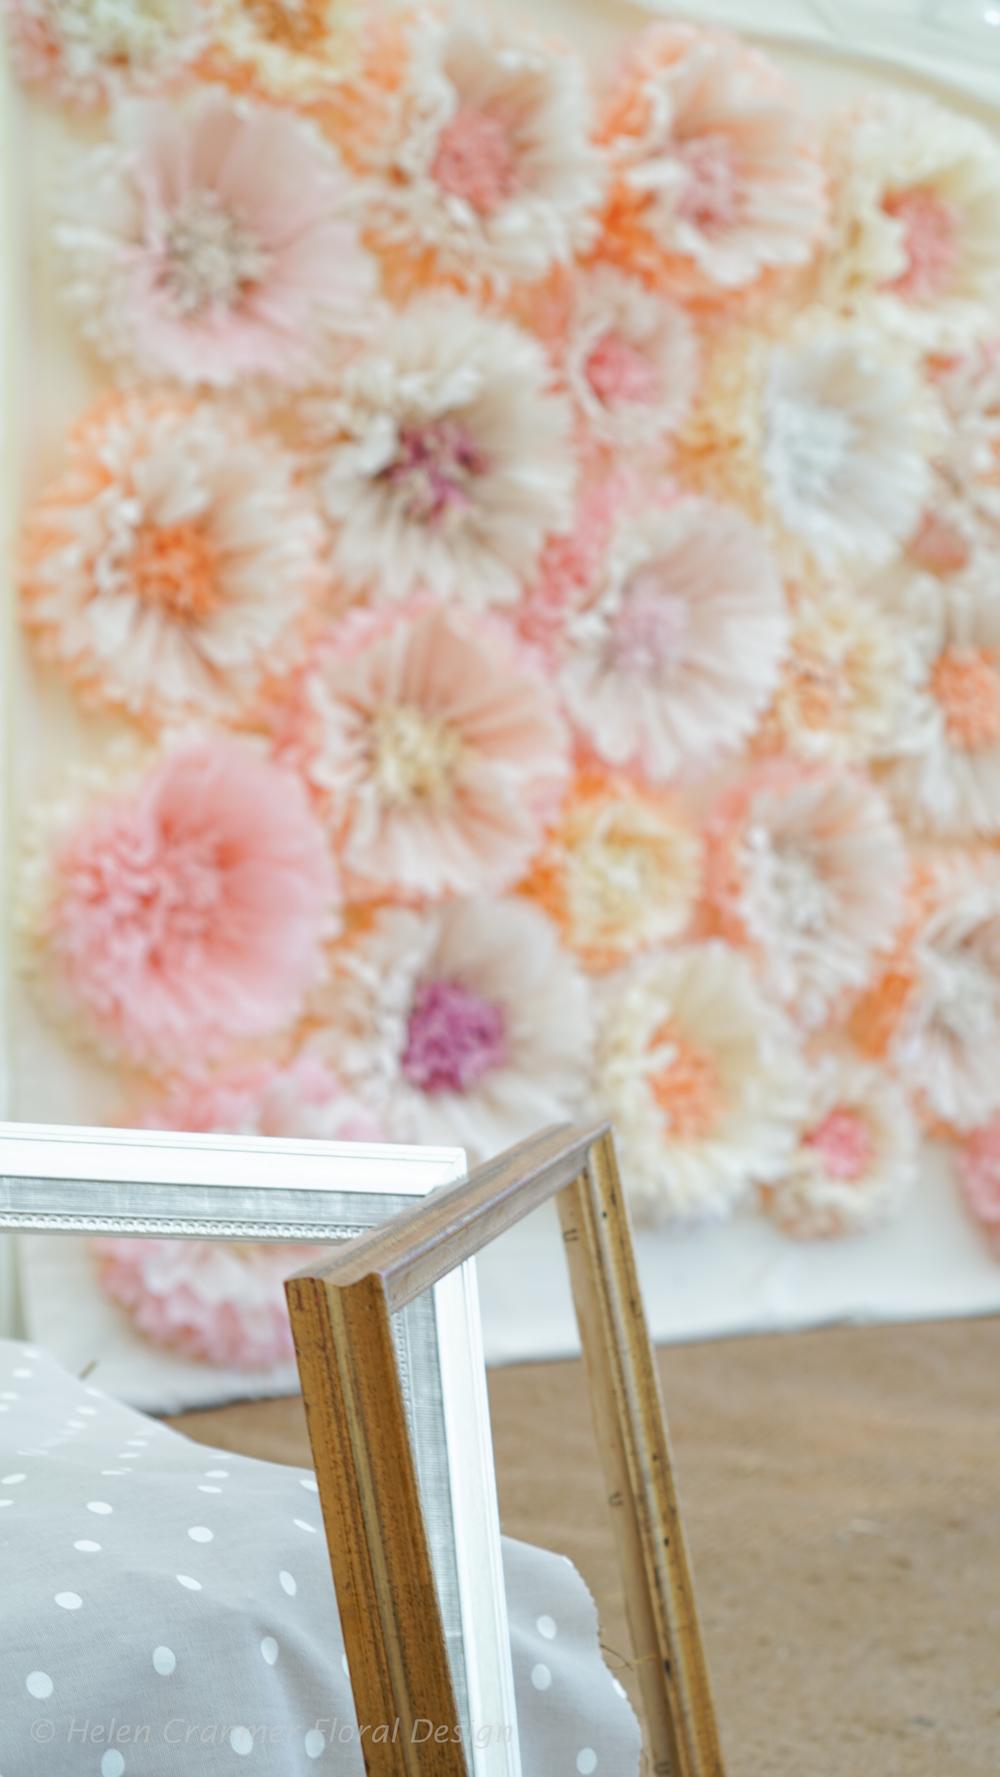 September flowers weddings (8 of 40).jpg